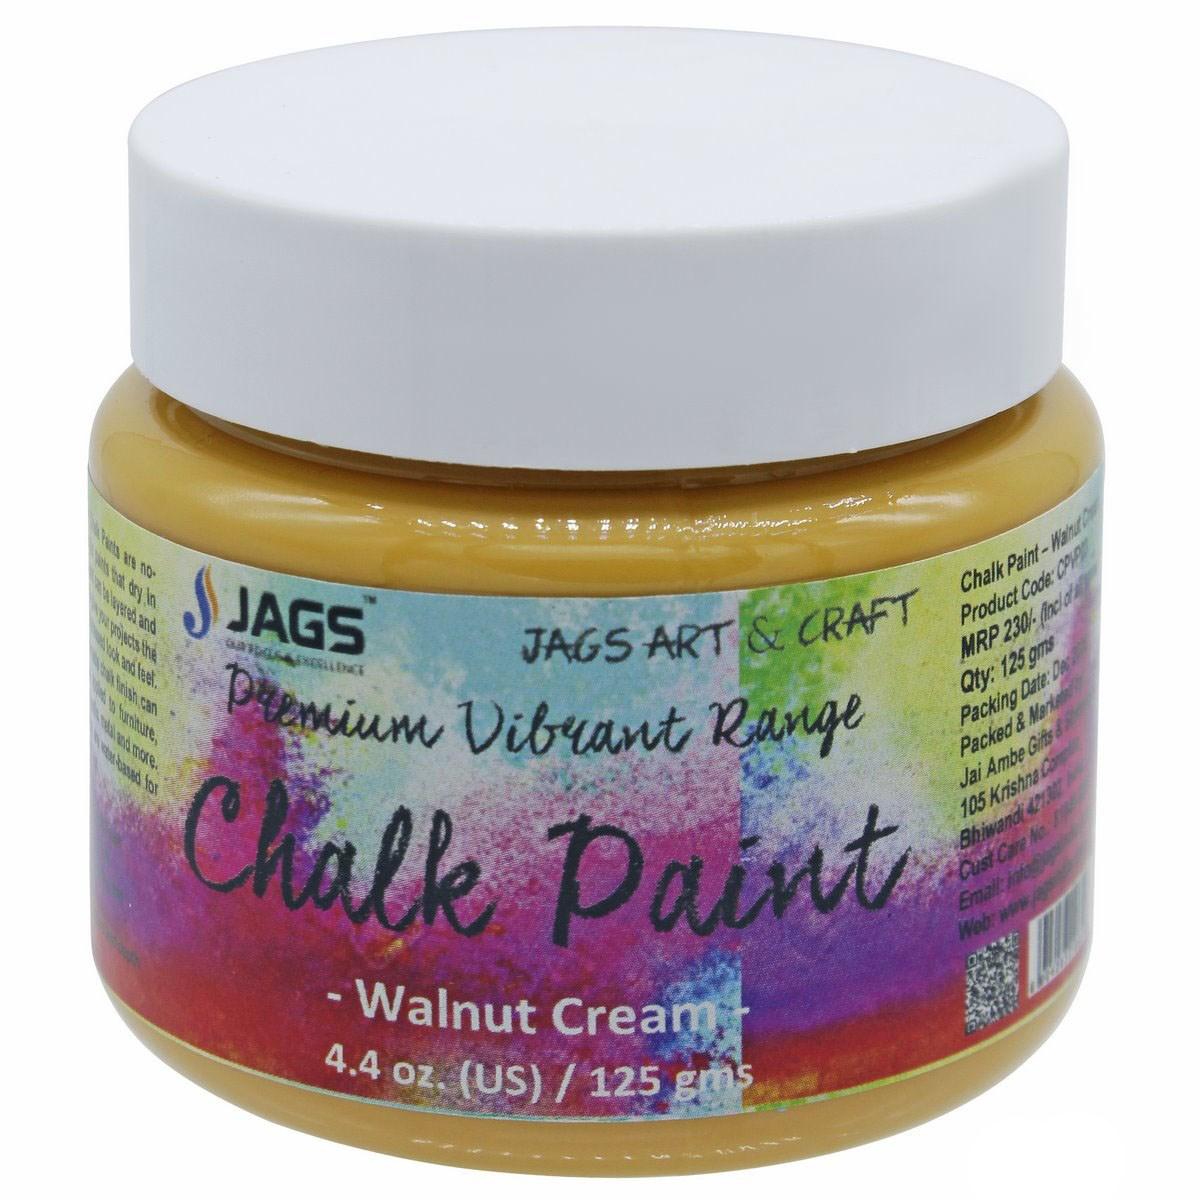 Premium vibrant Range Chalk Paint Walnut Cream